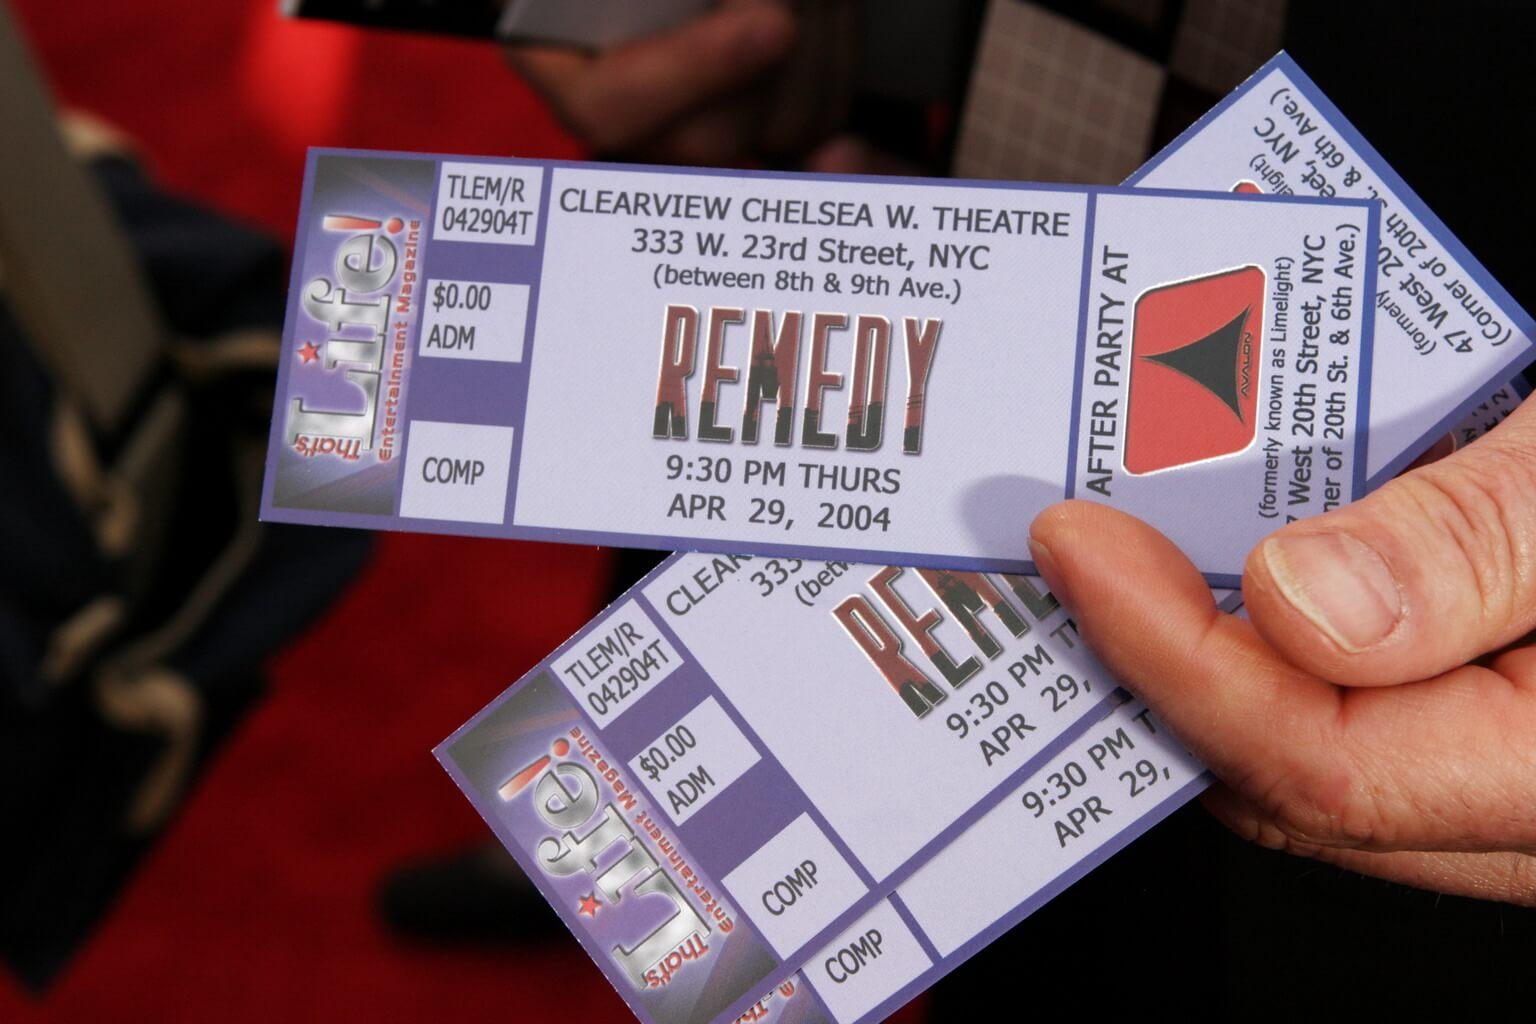 Remedy Film Premiere Tickets